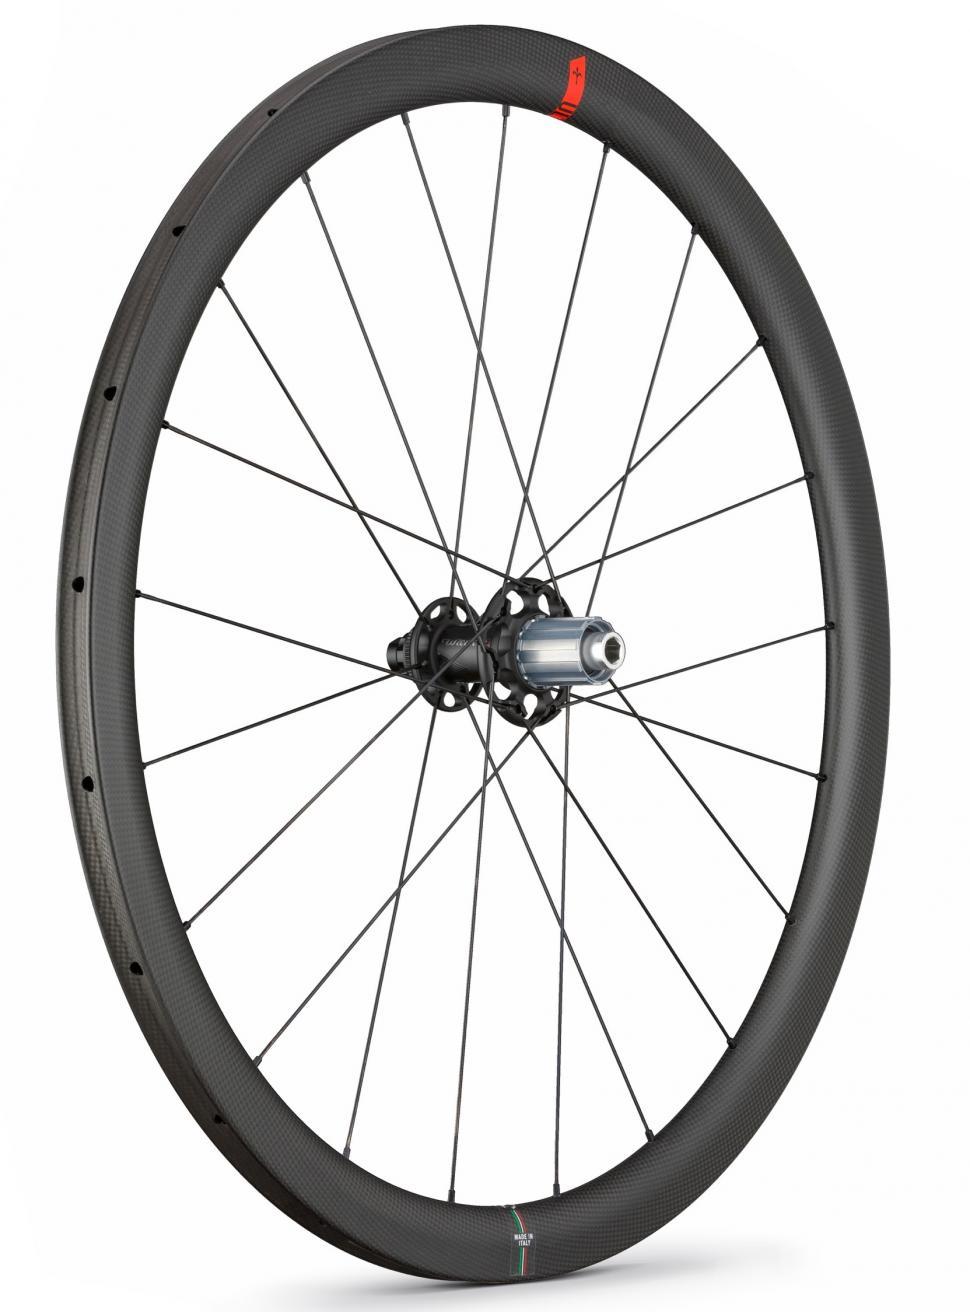 Wilier wheels ULT38KT-Back-Treq